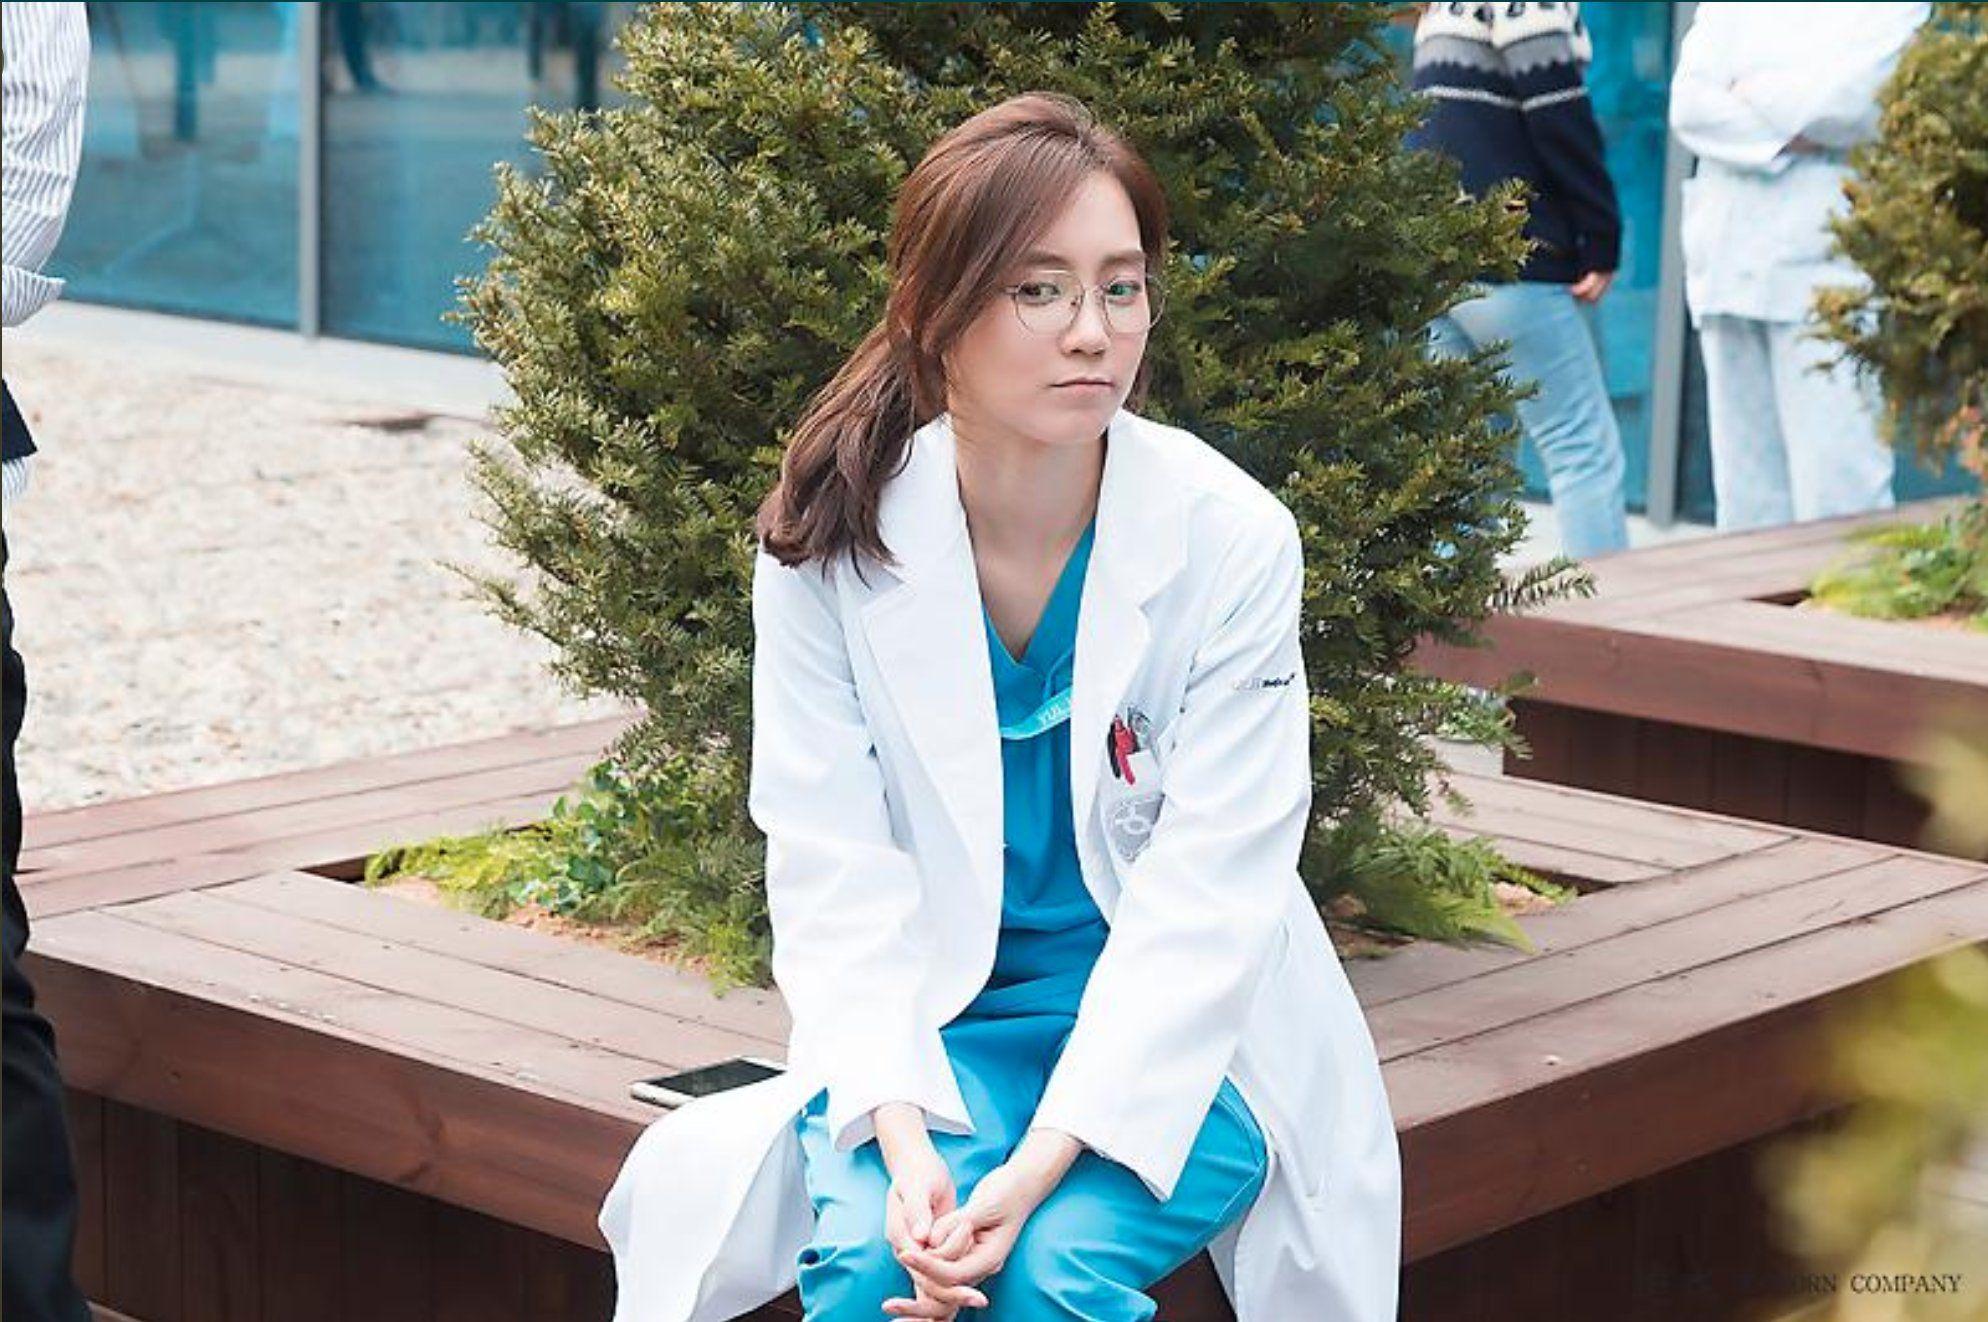 Pin oleh 아르트♥에리 di Hospital Playlist di 2020